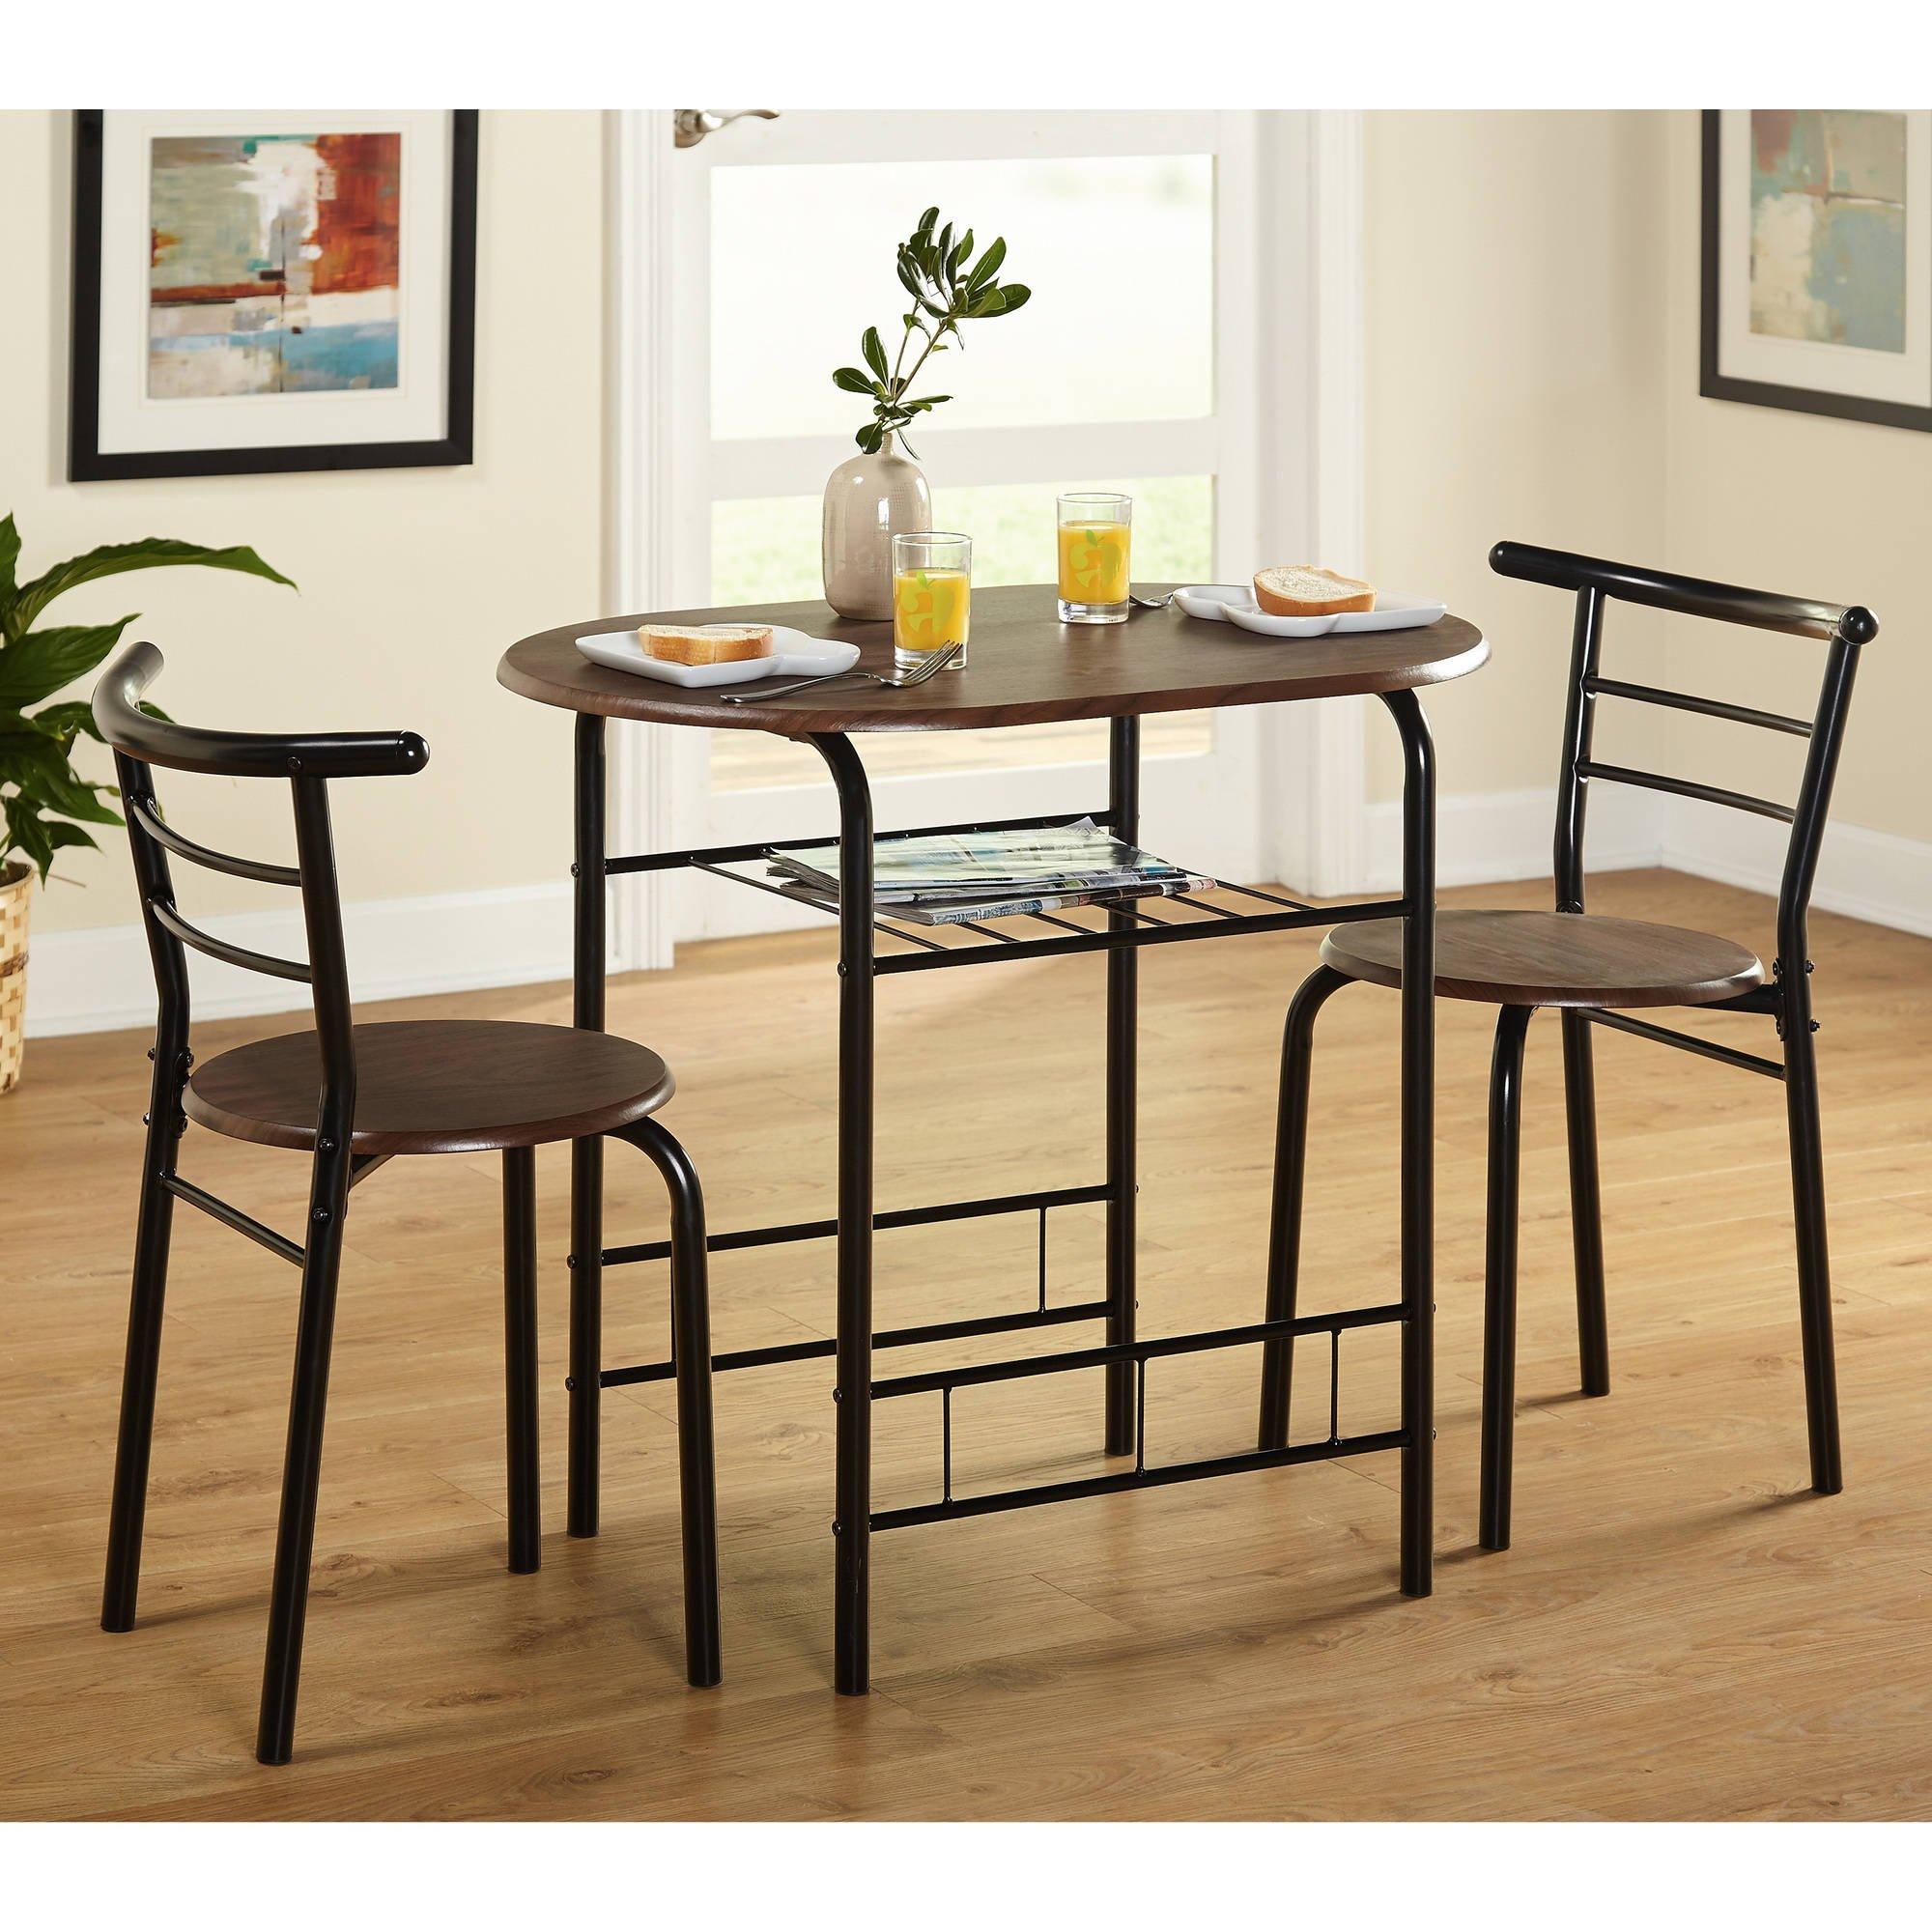 Get Quotations · Kissmoji 3 Piece Dining Set Breakfast Bar Kitchen Table Chairs  Furniture (Black)